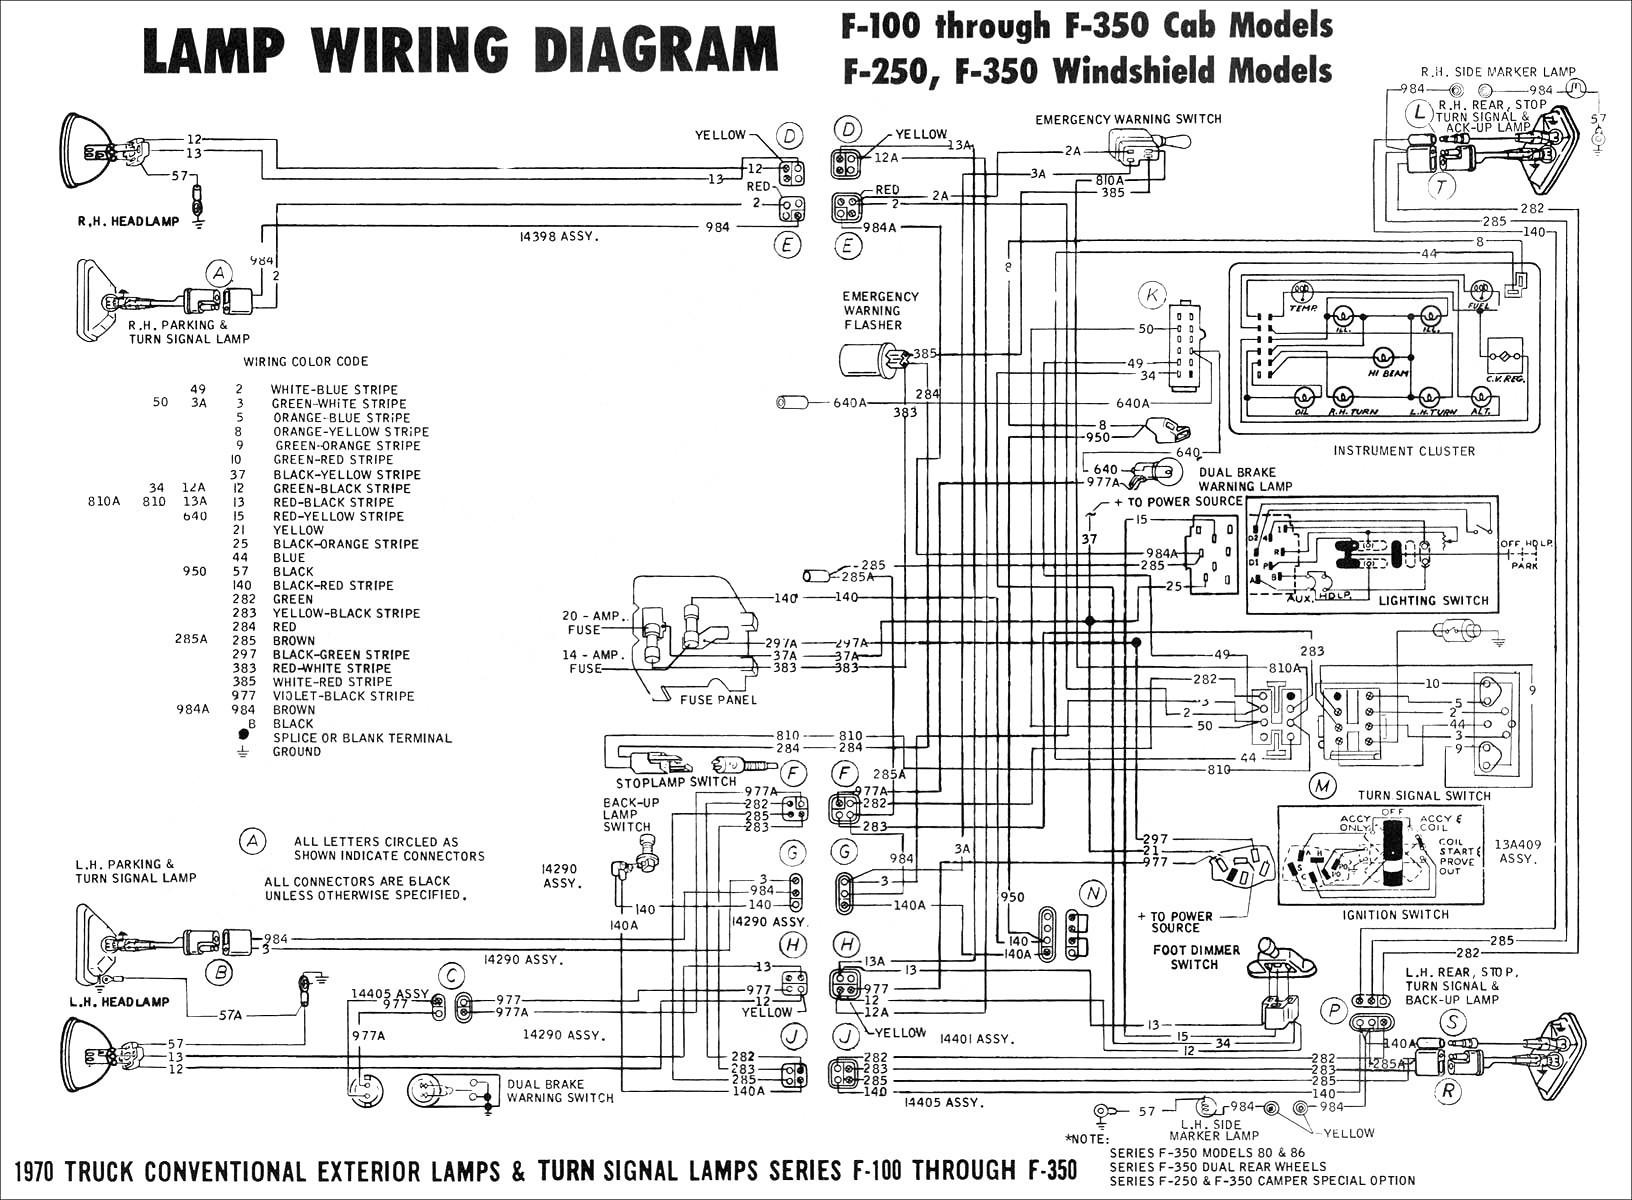 1999 audi a4 relay diagram plete wiring diagrams u2022 rh 207 246 78 188 4 Post